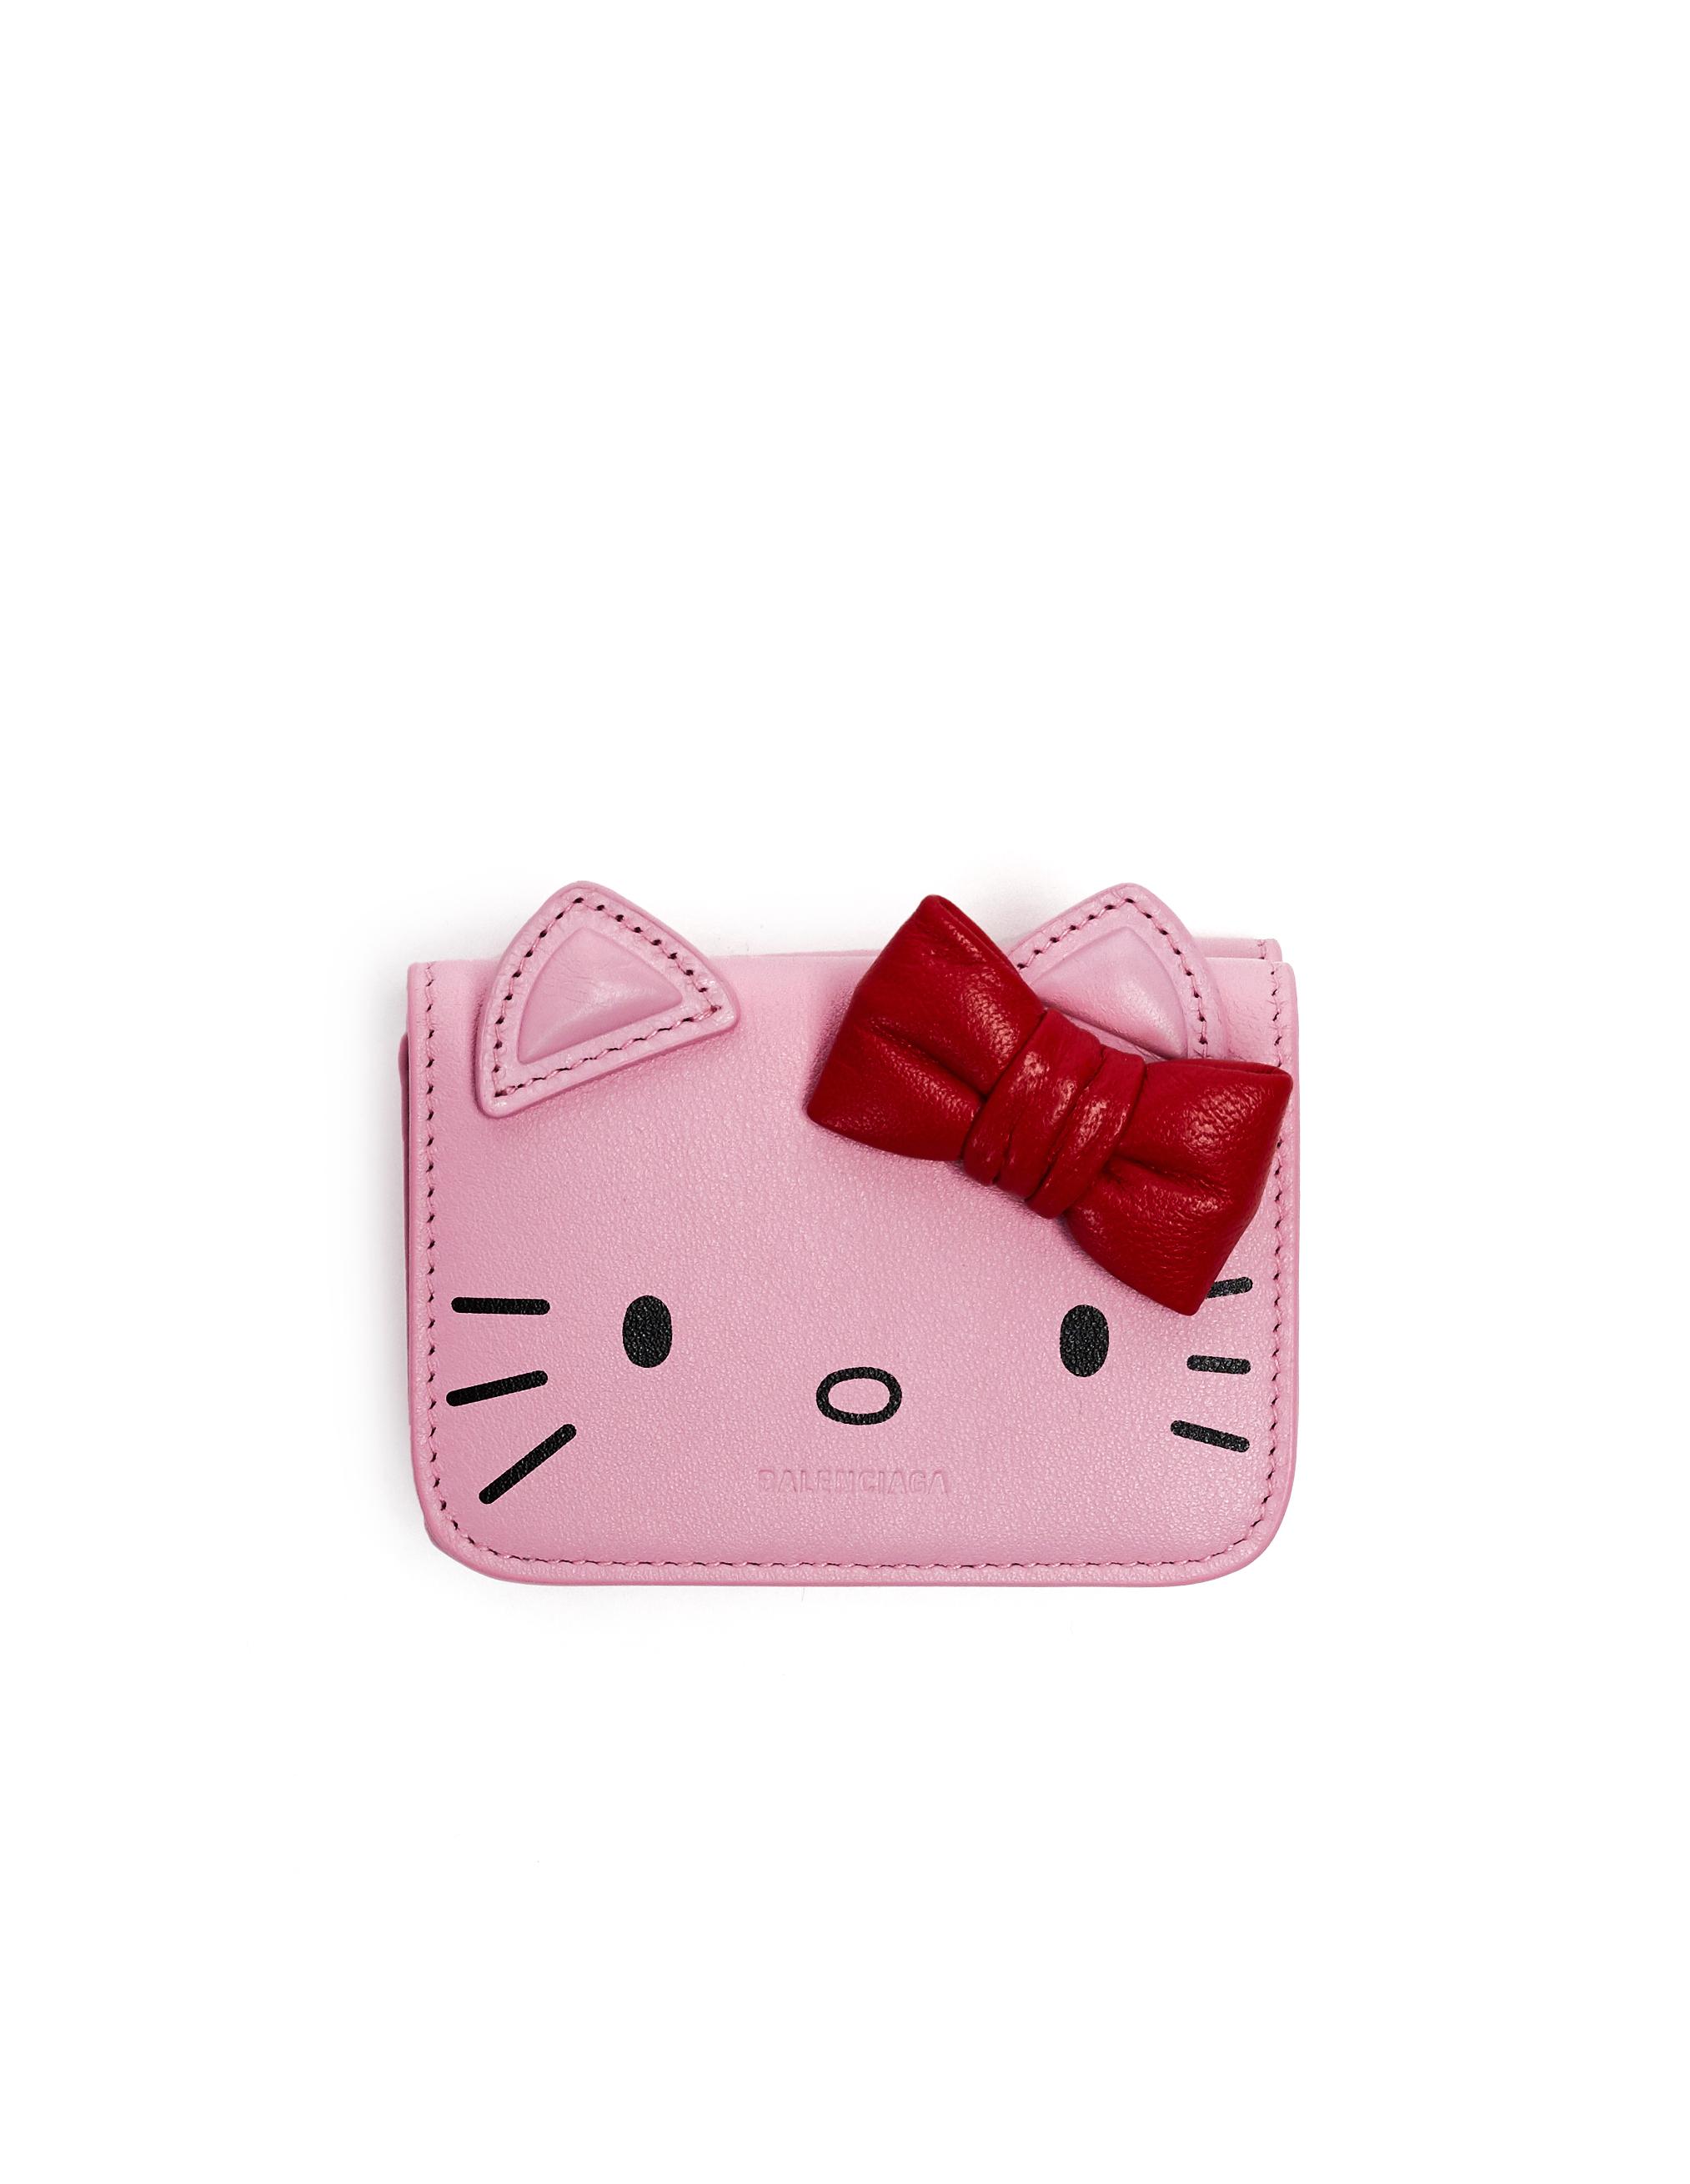 Balenciaga Pink Leather Hello Kitty Wallet